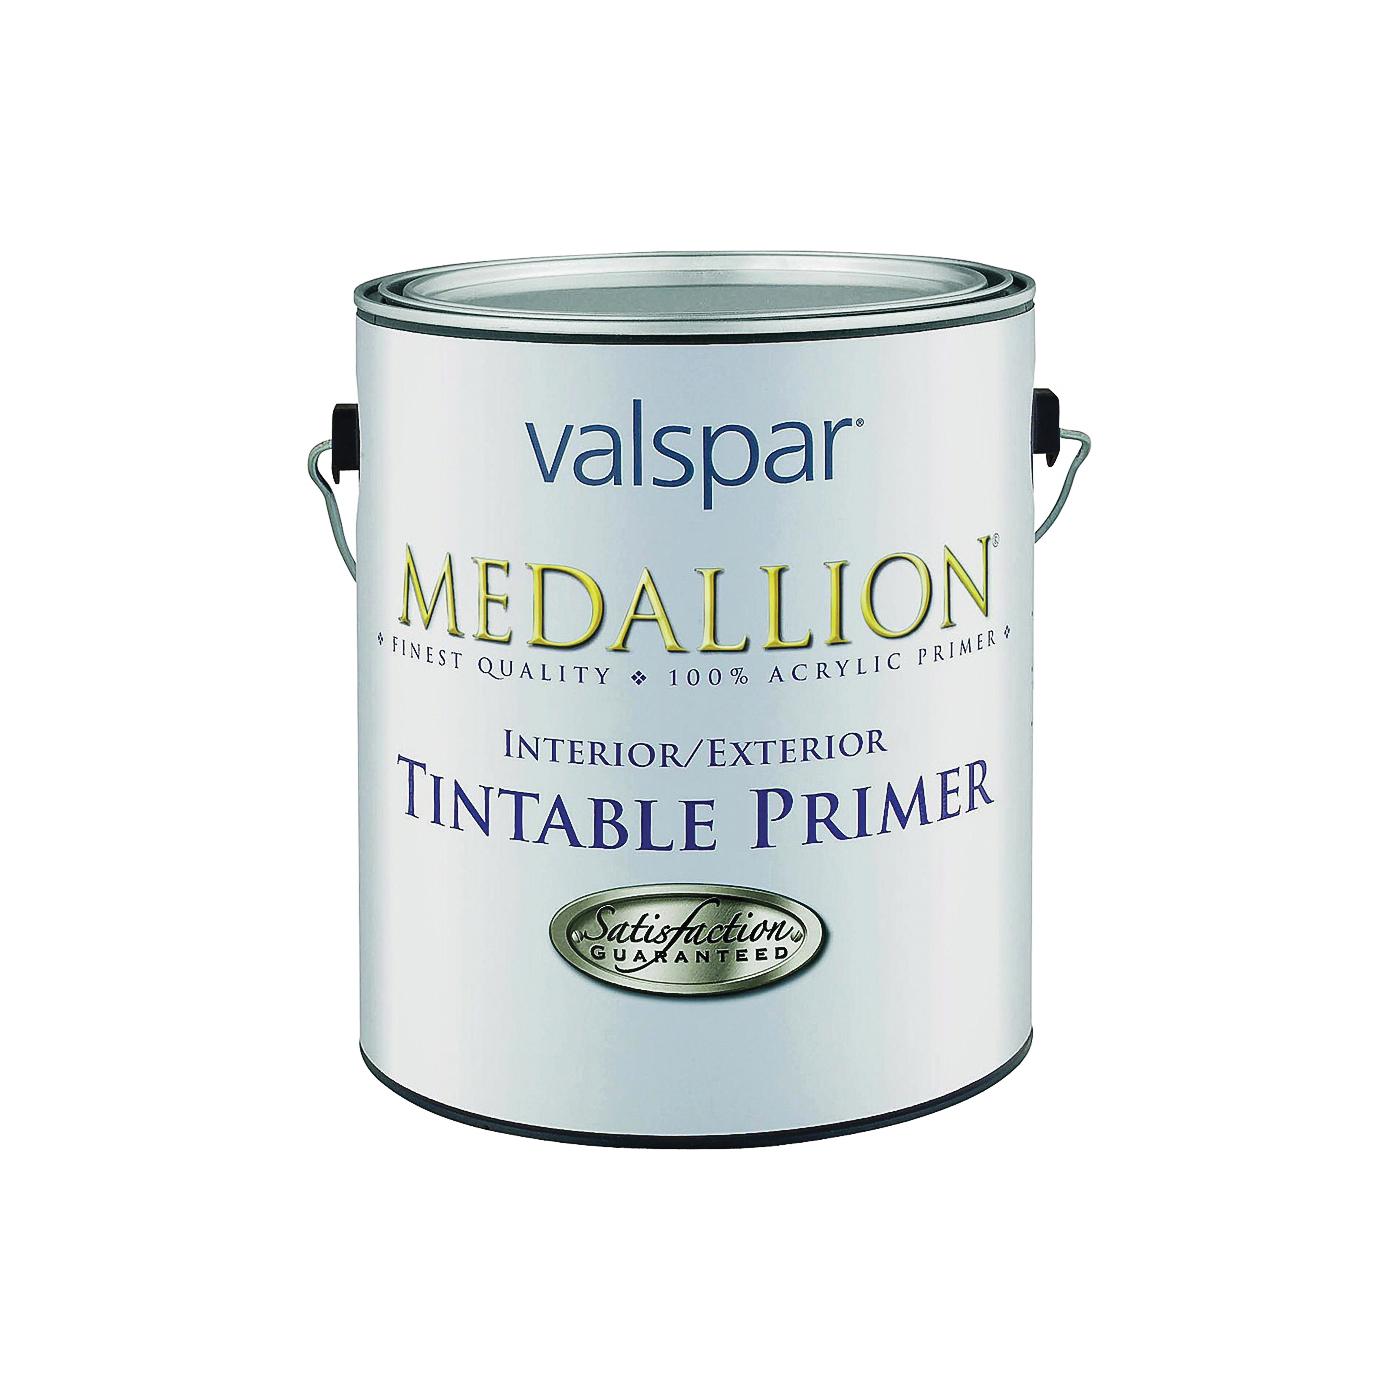 Picture of Valspar Medallion 192 Tintable Primer, Gray, 1 gal, Pail